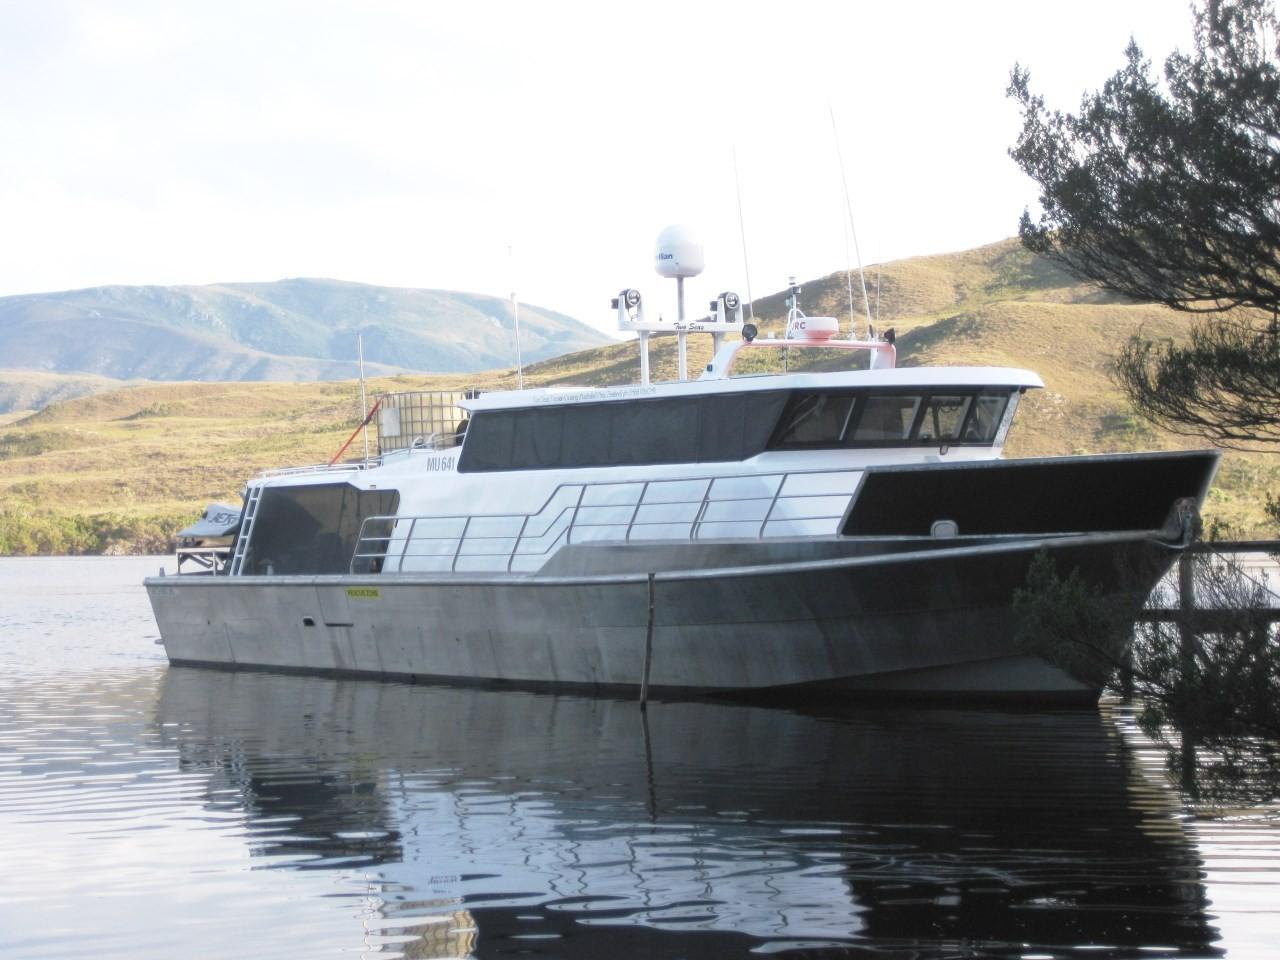 2006 Legend Boats Aluminum Exploration Vessel Power Boat